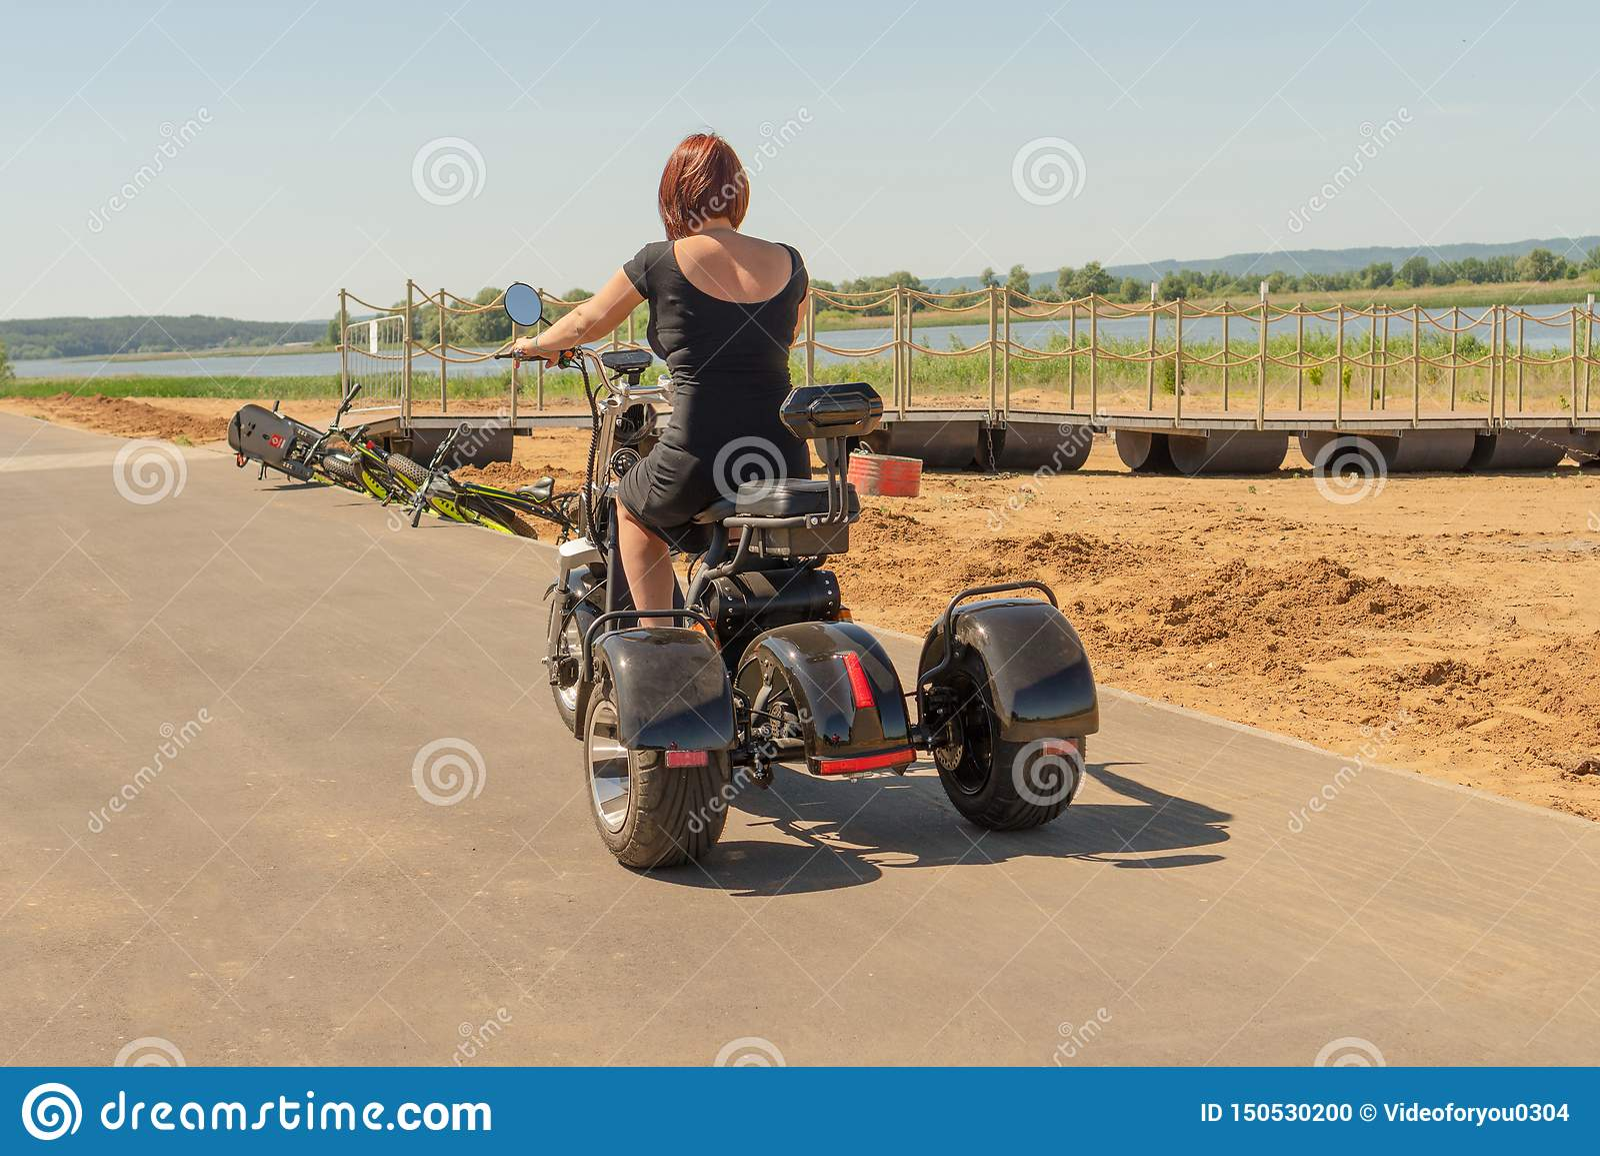 Rusland, Bolgar - Juni 08, 2019 Kol Gali Resort Spa: Een jong meisje in een zwarte kleding met rood haar die haar three-wheeled e